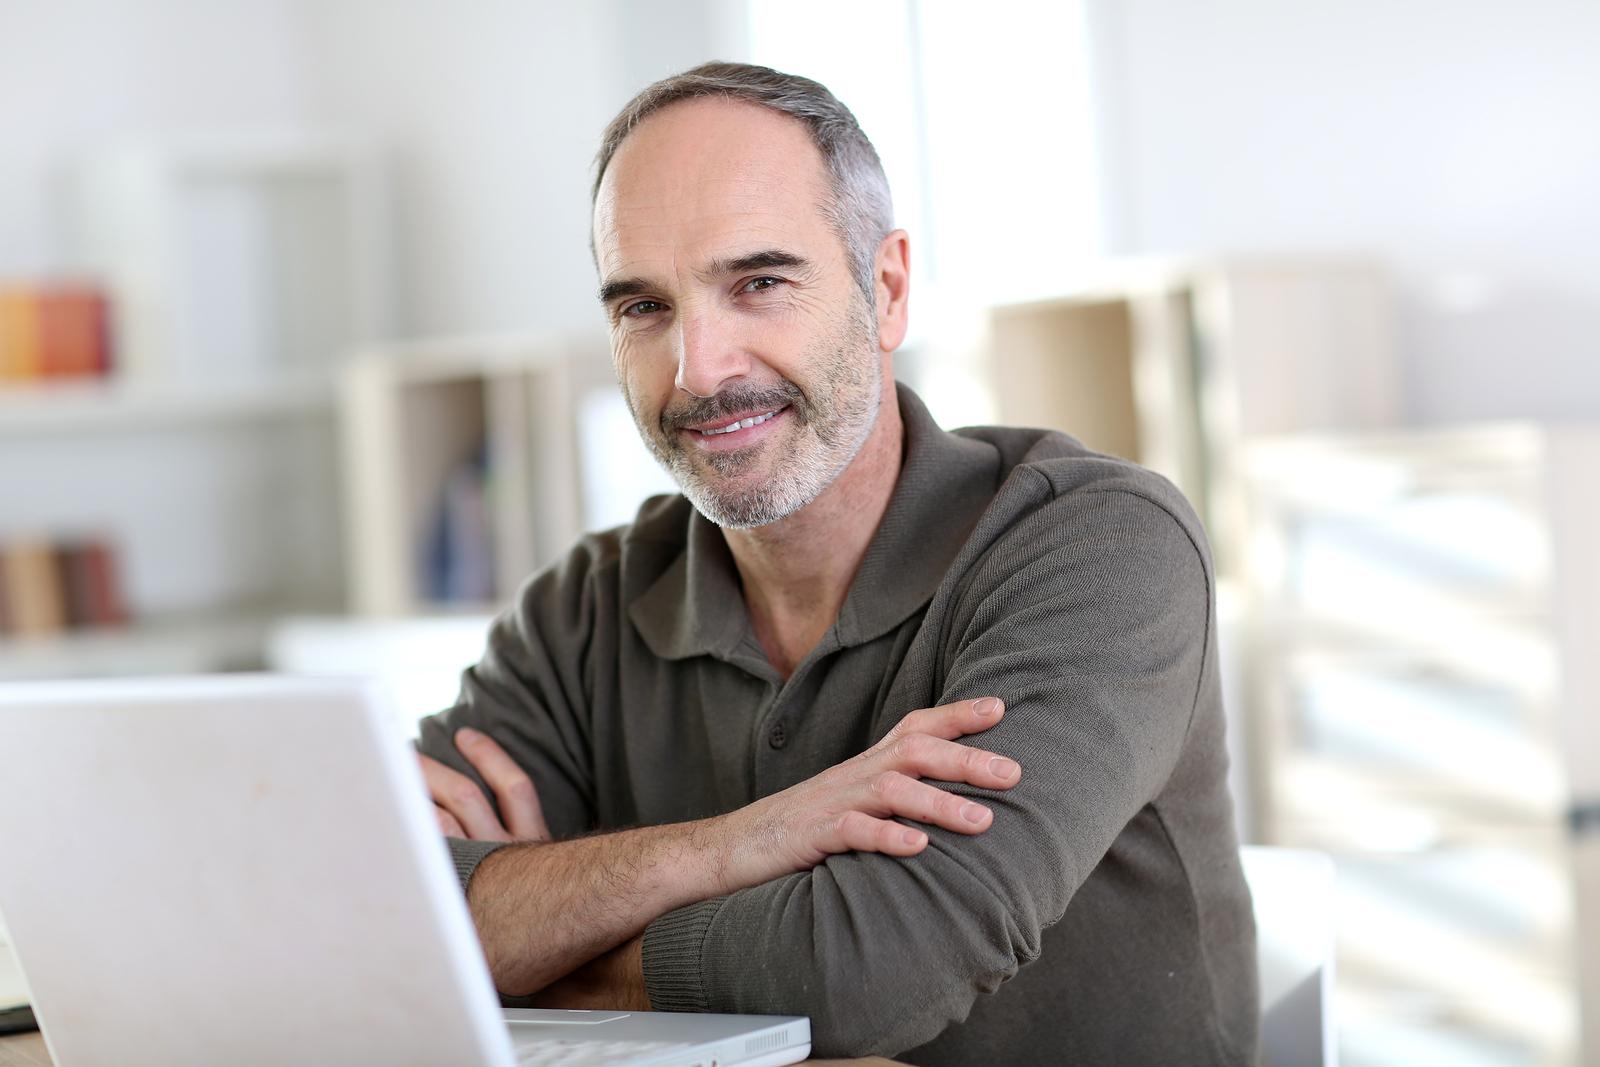 bigstock Senior man working from home w 54884129 - Marketing